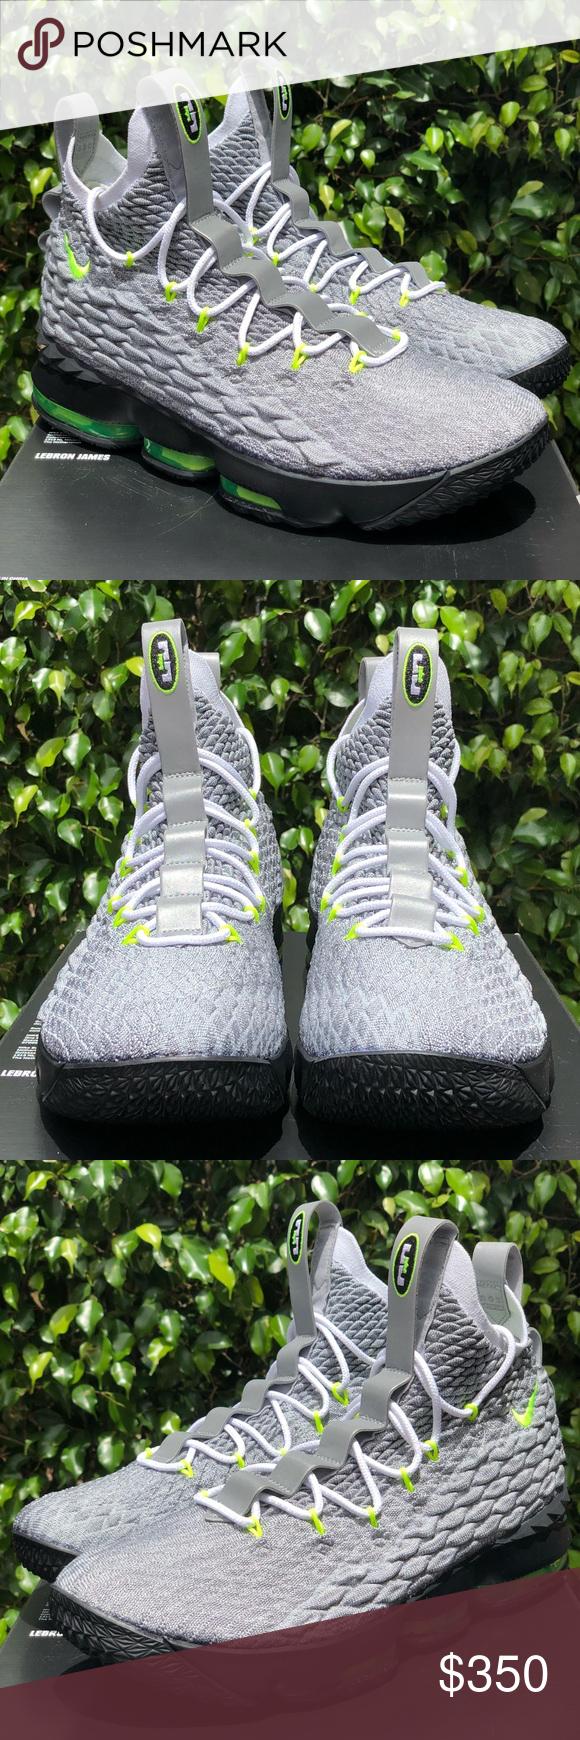 894994b3436 Nike Lebron XV 15 Air Max 95 PE Neon Green Grey 😁Brand New - Never